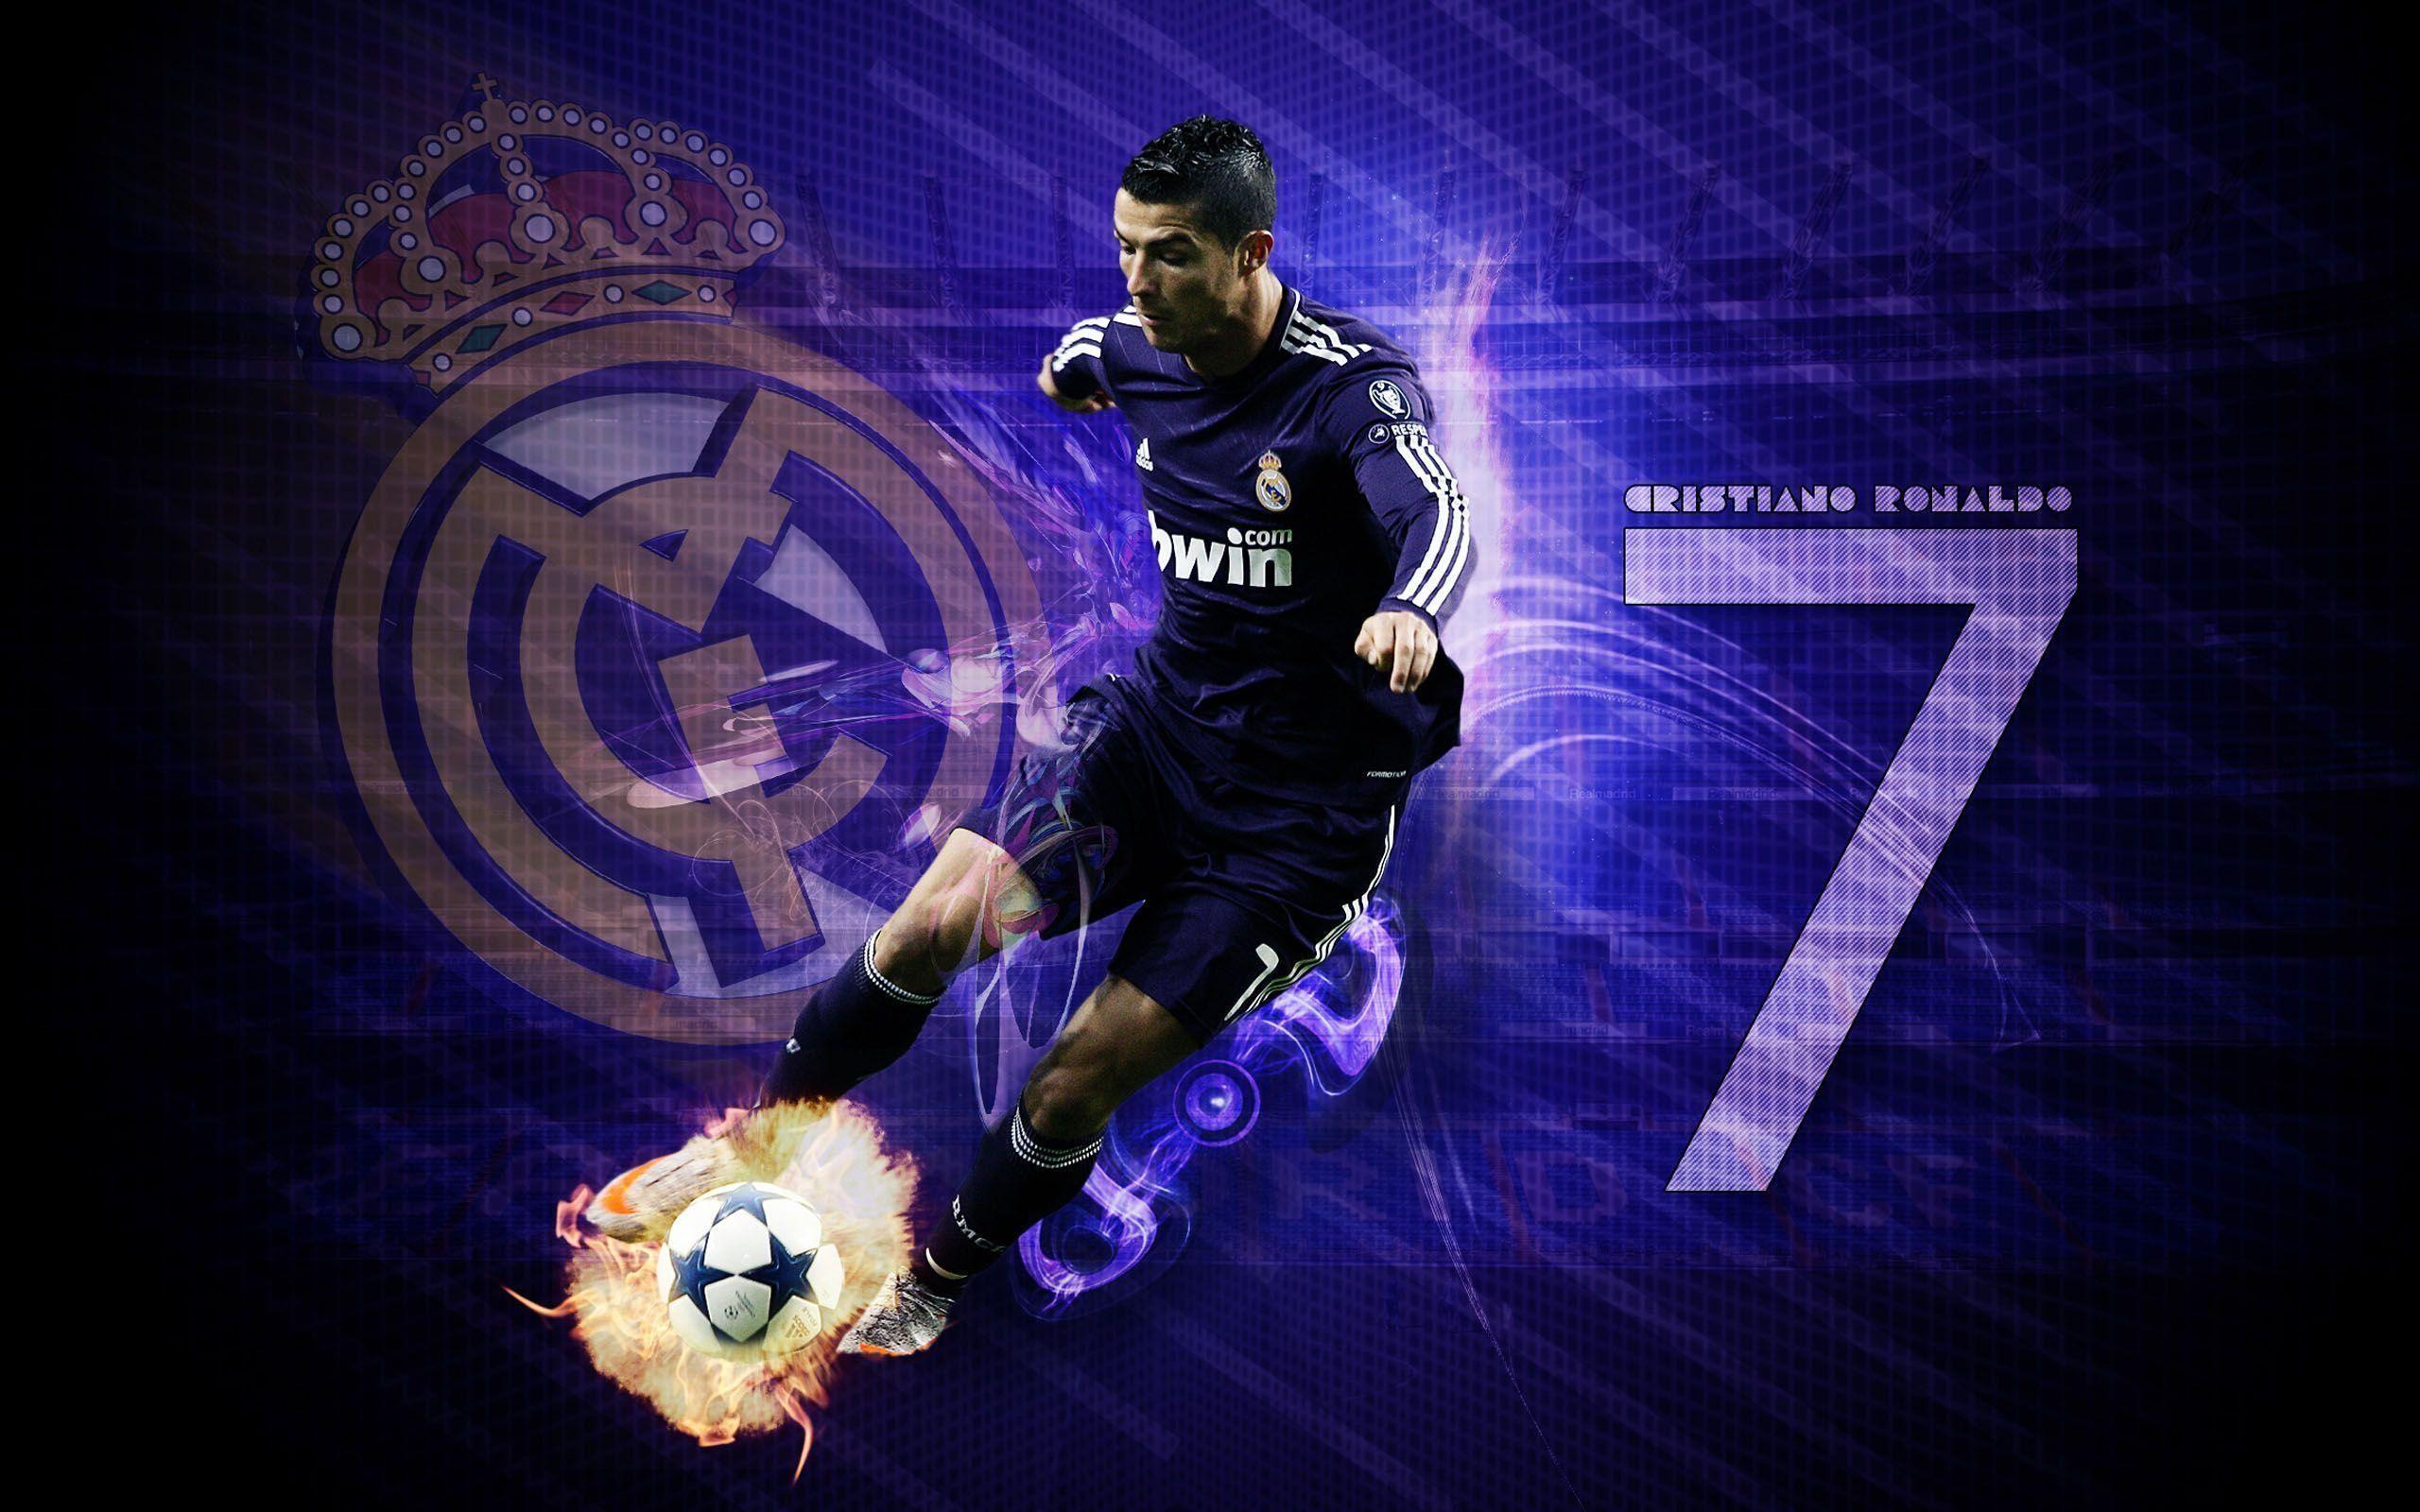 Best Hd Ronaldo Real Madrid Wallpaper High Definition Wallpaper Real Madrid Wallpapers Madrid Wallpaper Sports Wallpapers